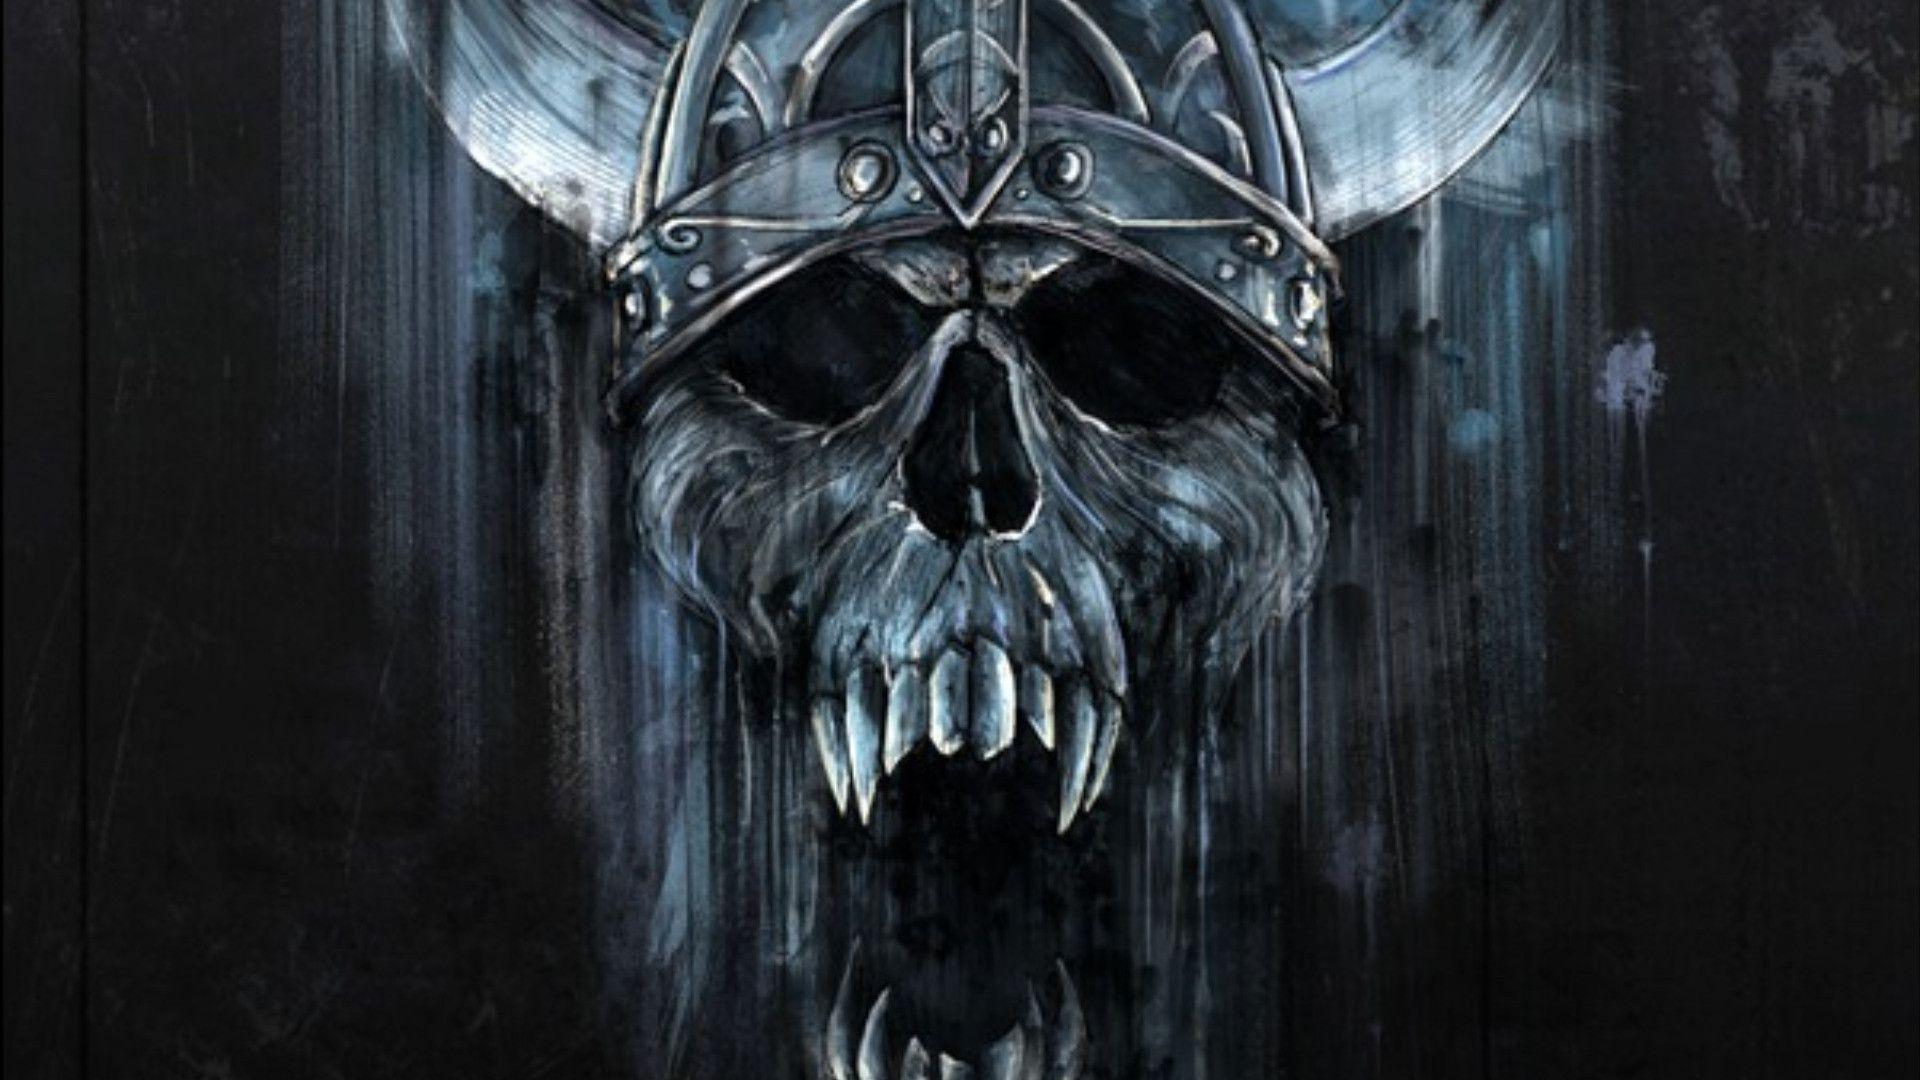 Full <b>HD</b> Wallpaper the <b>punisher skull</b> logo dark spray, Desktop ...